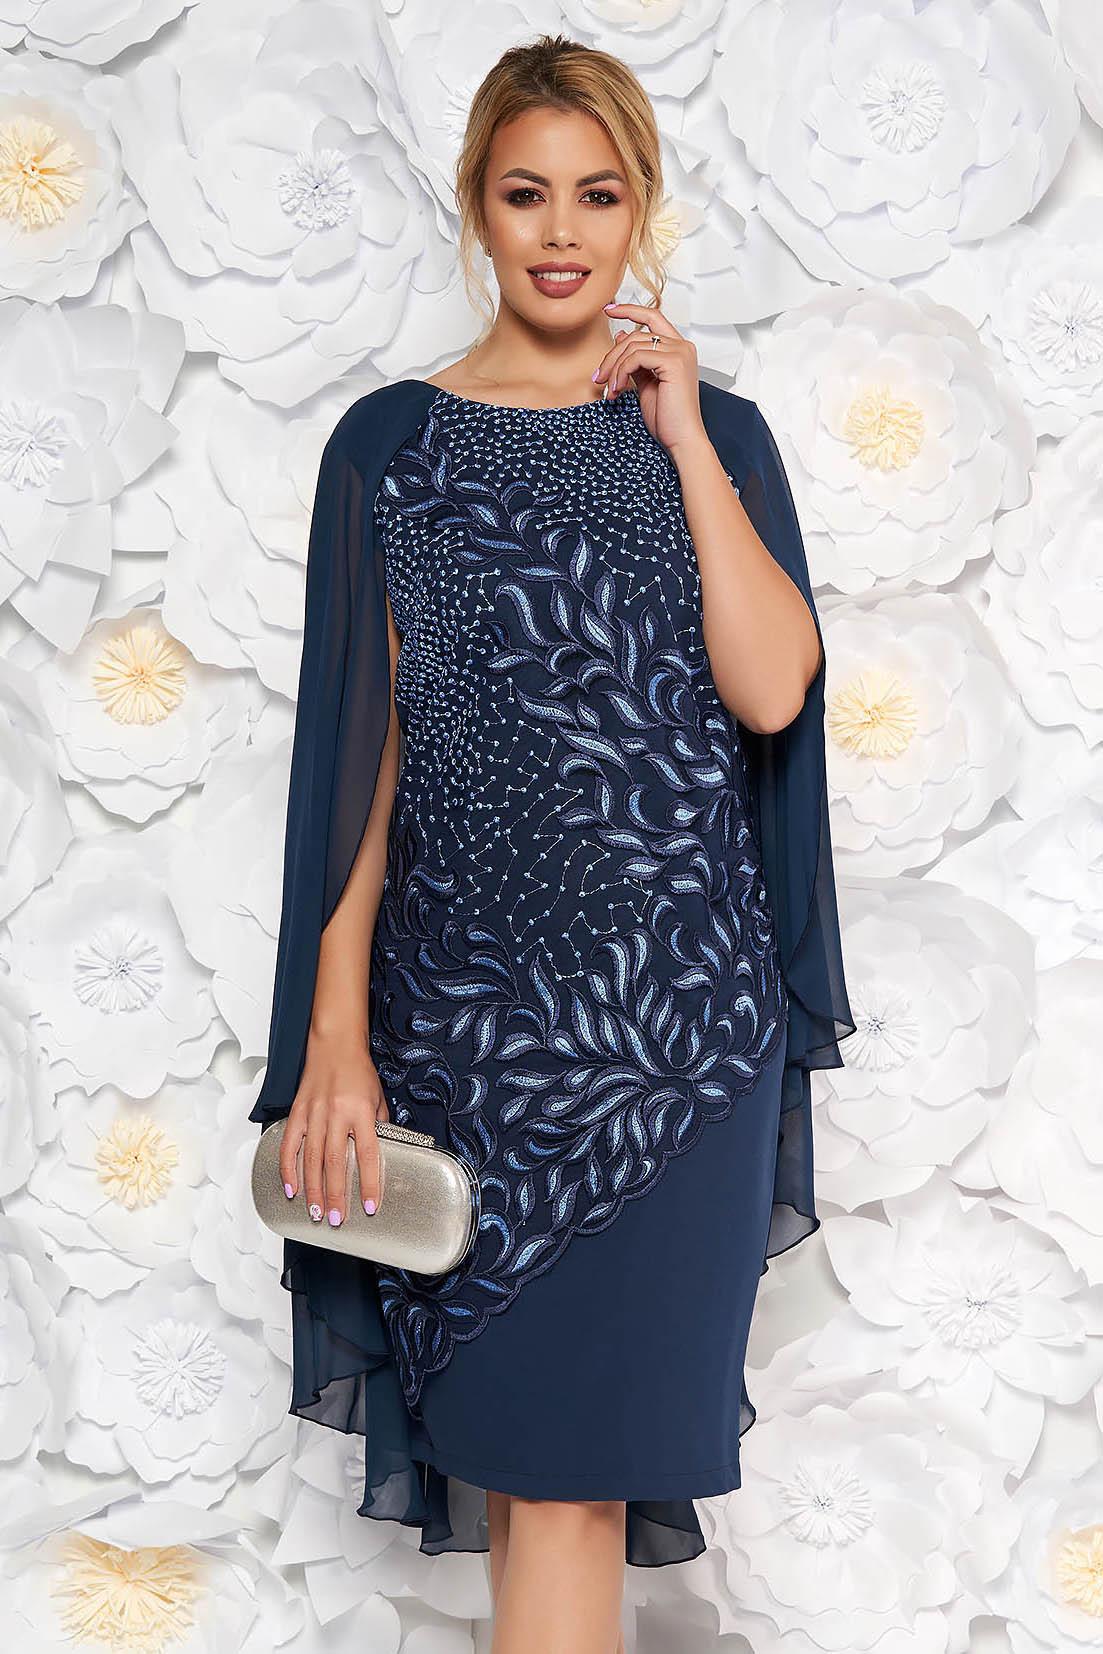 Rochie albastra-inchis de ocazie midi din stofa subtire usor elastica suprapunere cu dantela